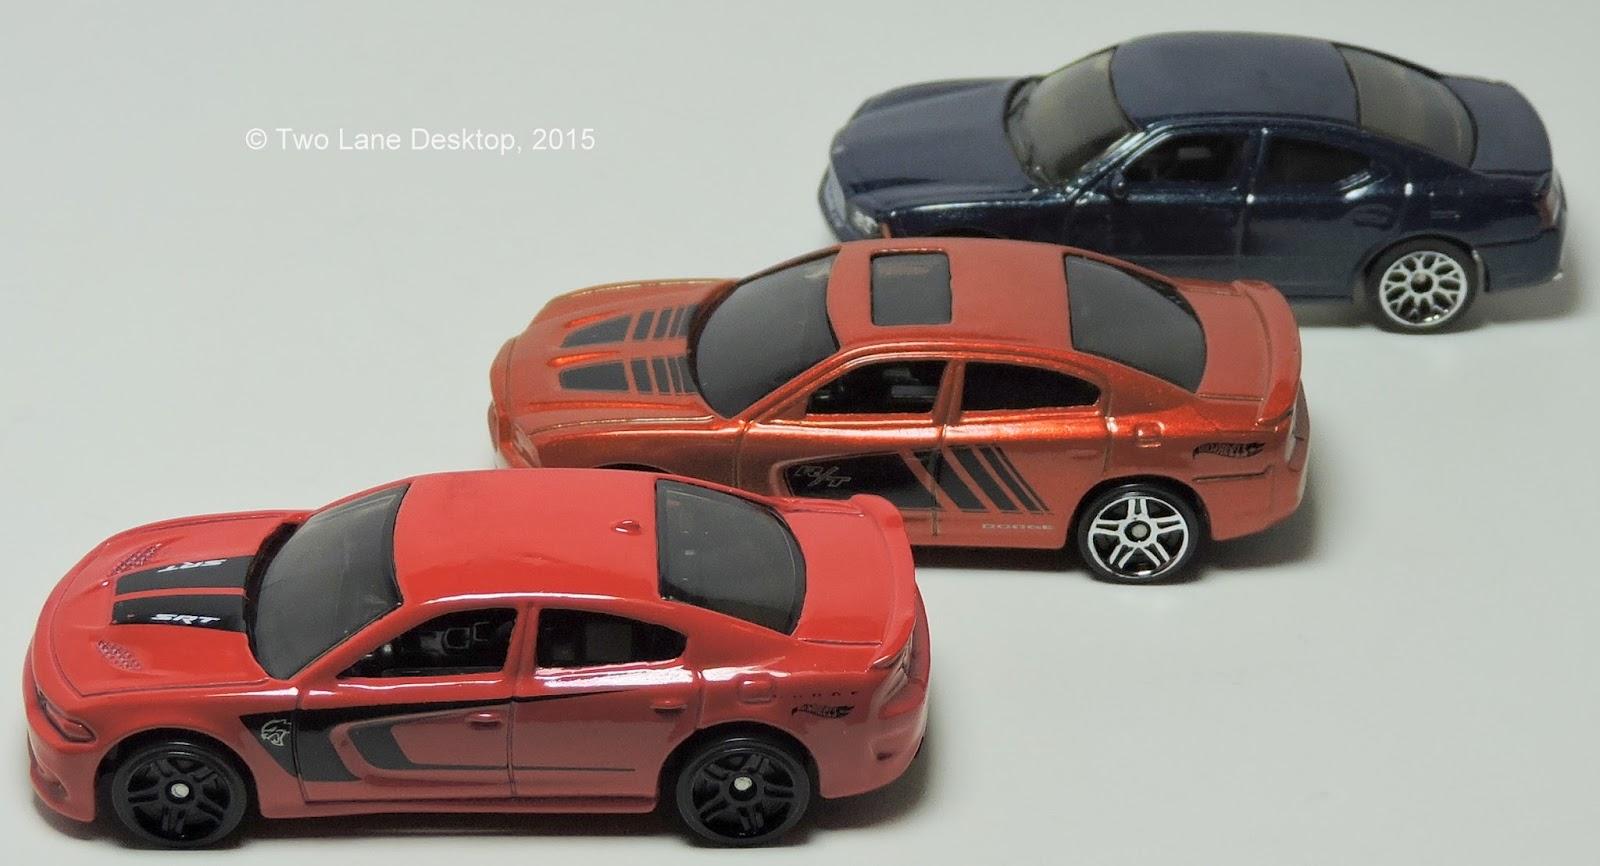 Durango Power Steering Pump Diagram Light Schematic Of Running Dodge Dakota 4 7l V8 | Get Free Image About Wiring